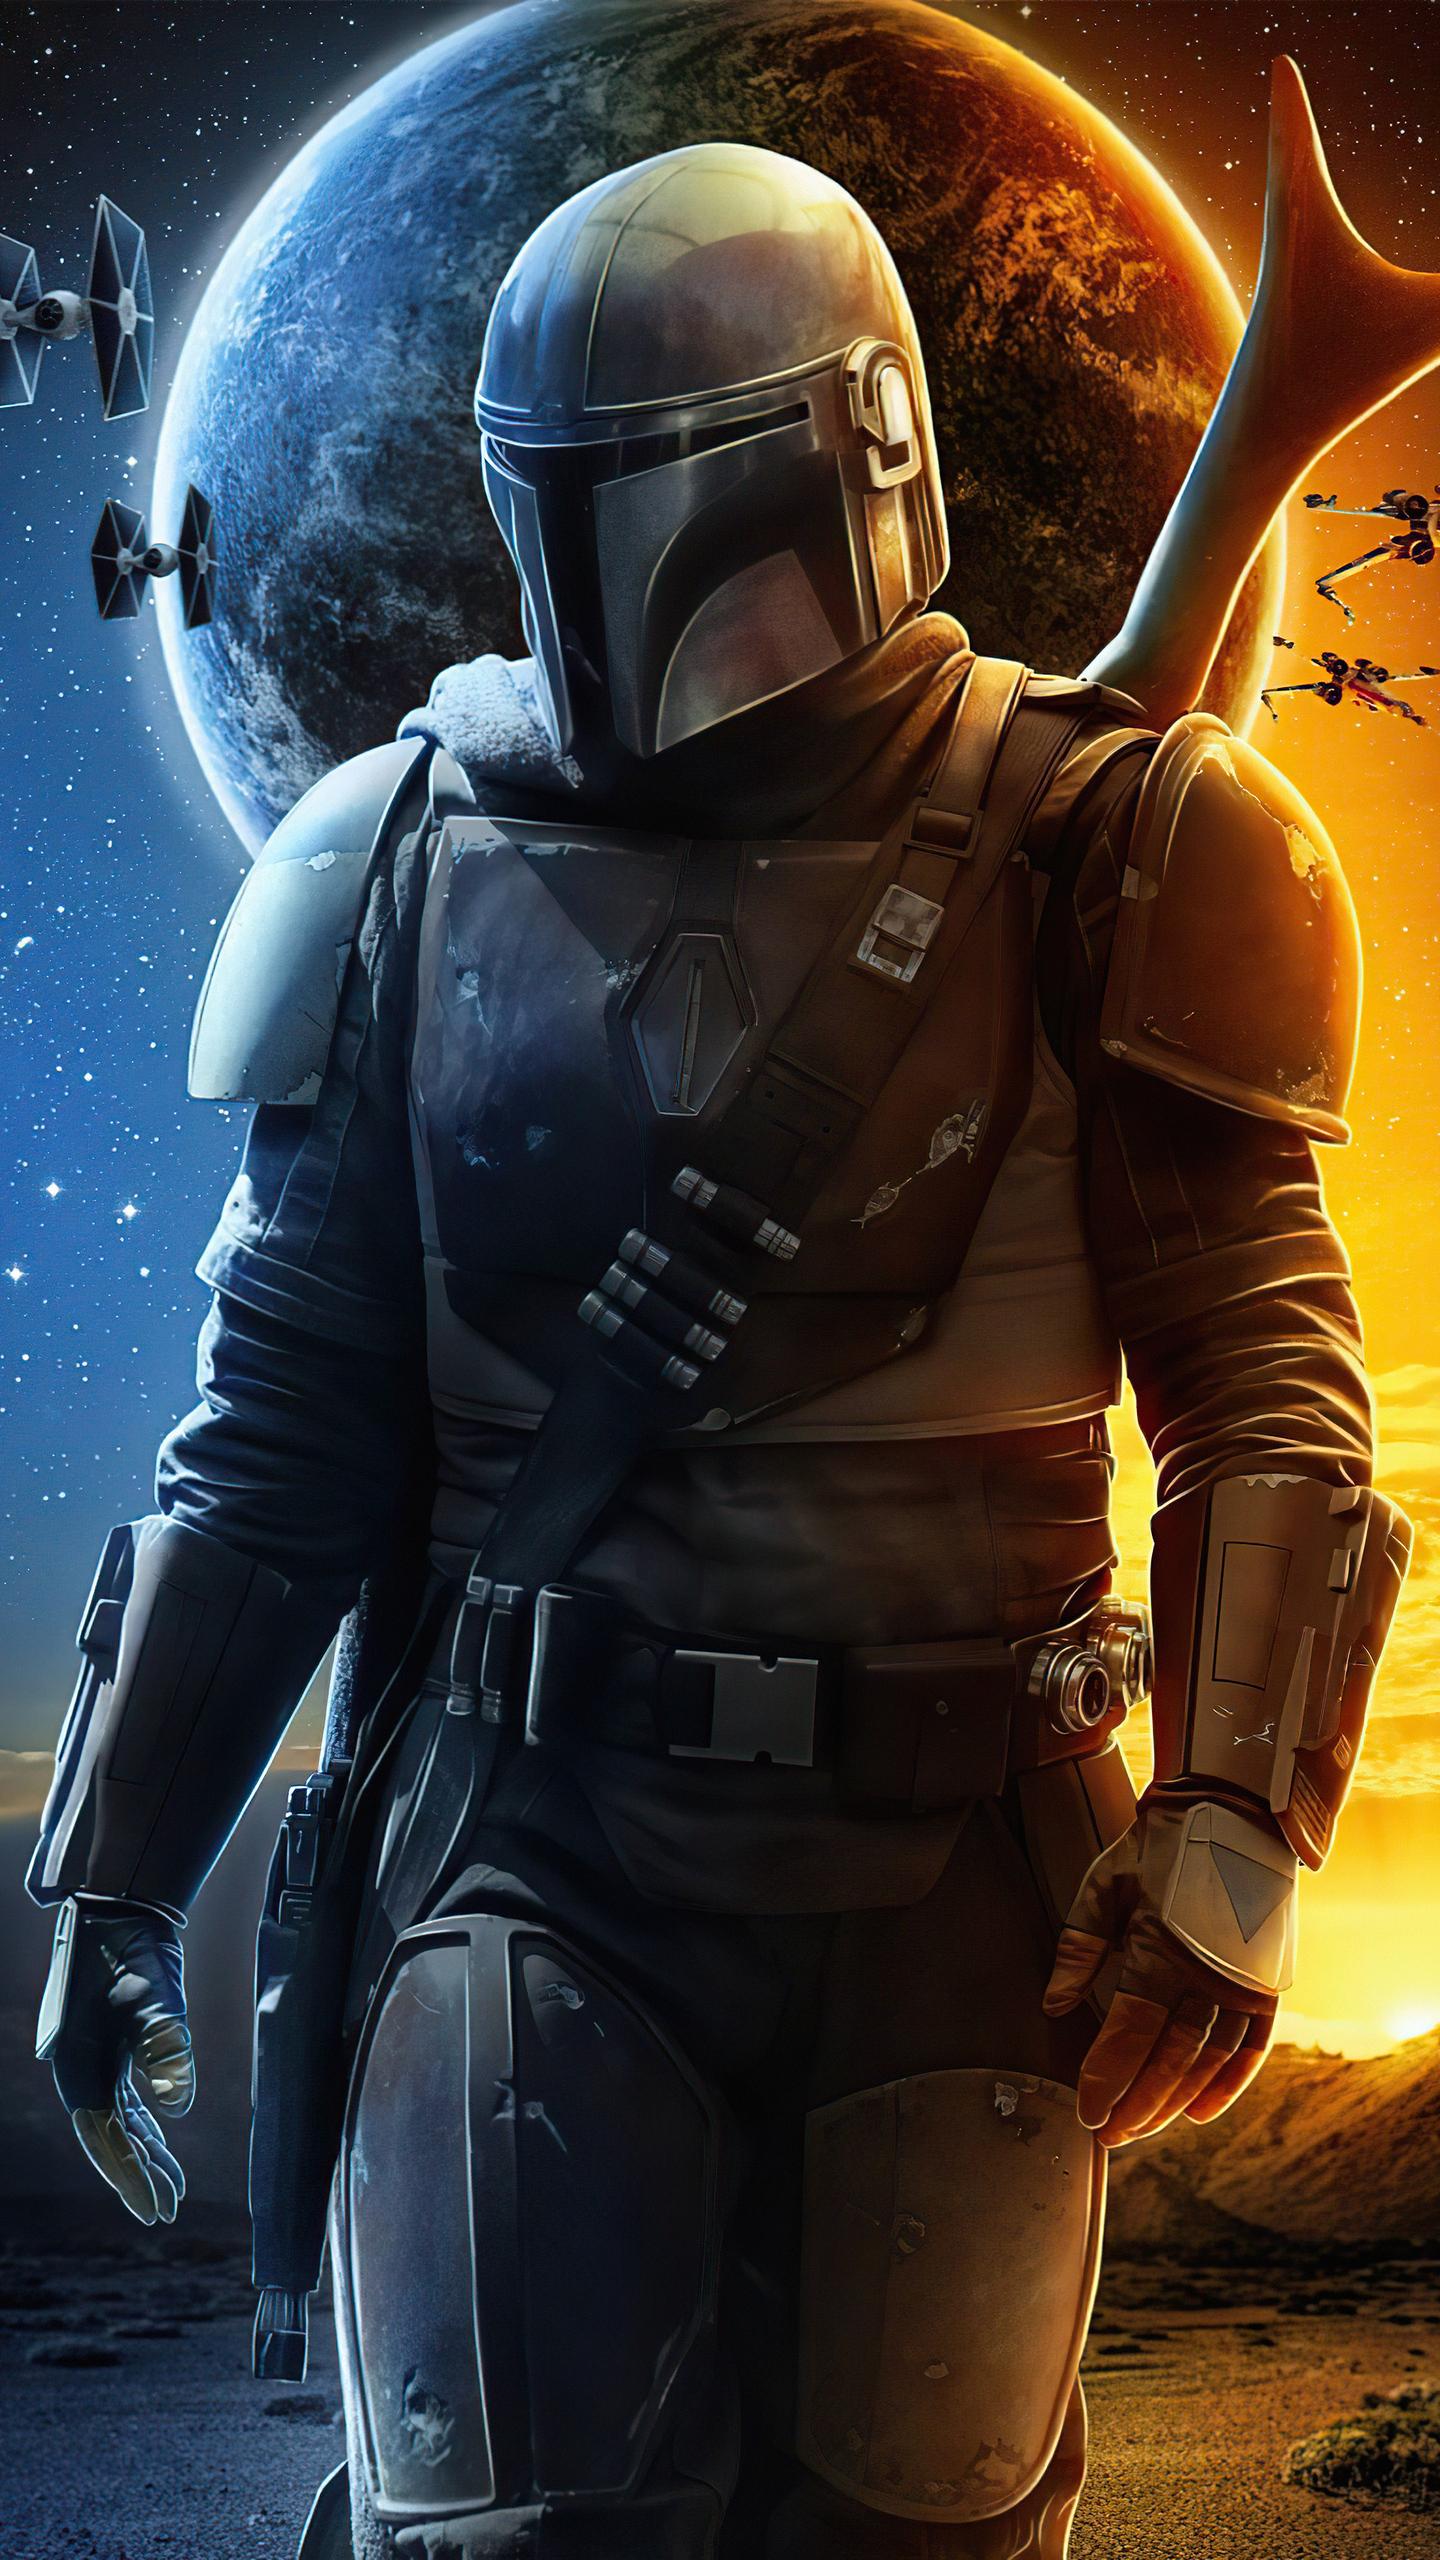 starwars-the-mandalorian-4k-bl.jpg